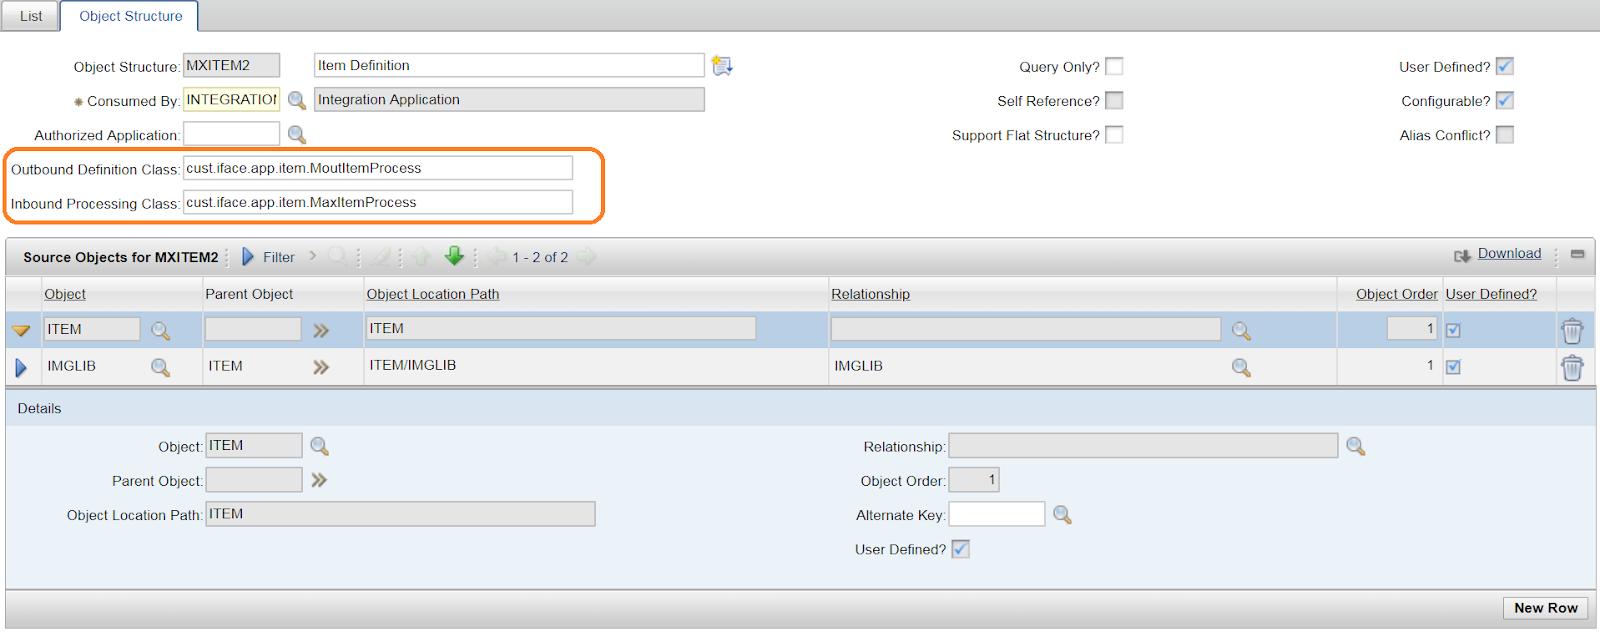 Maximo Consultant's Blog: Import/Export Maximo ImageLib Data